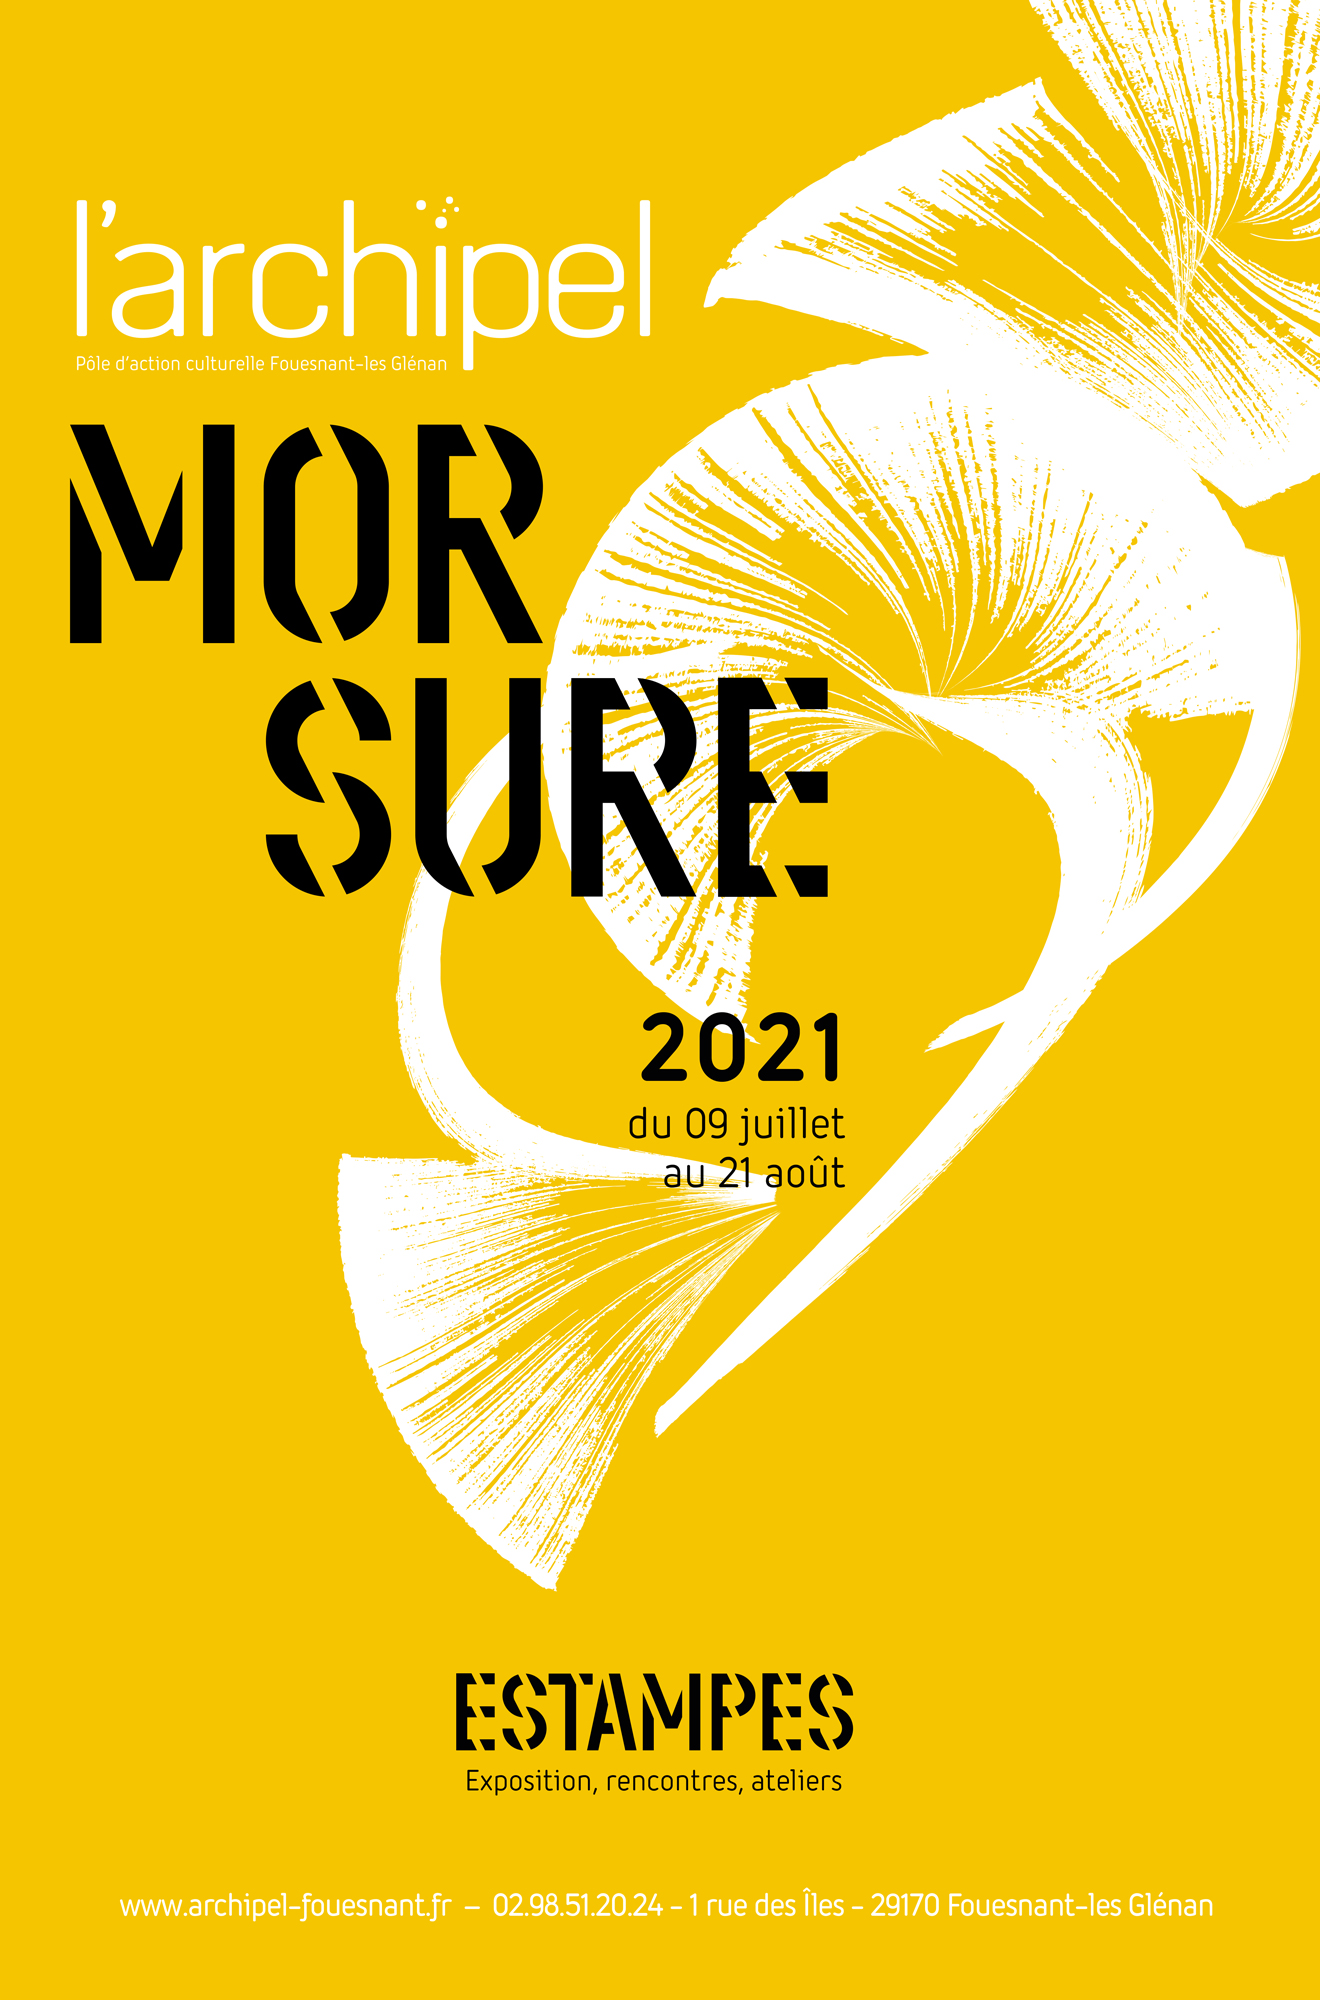 2283-ARCHIPEL-MORSURE-